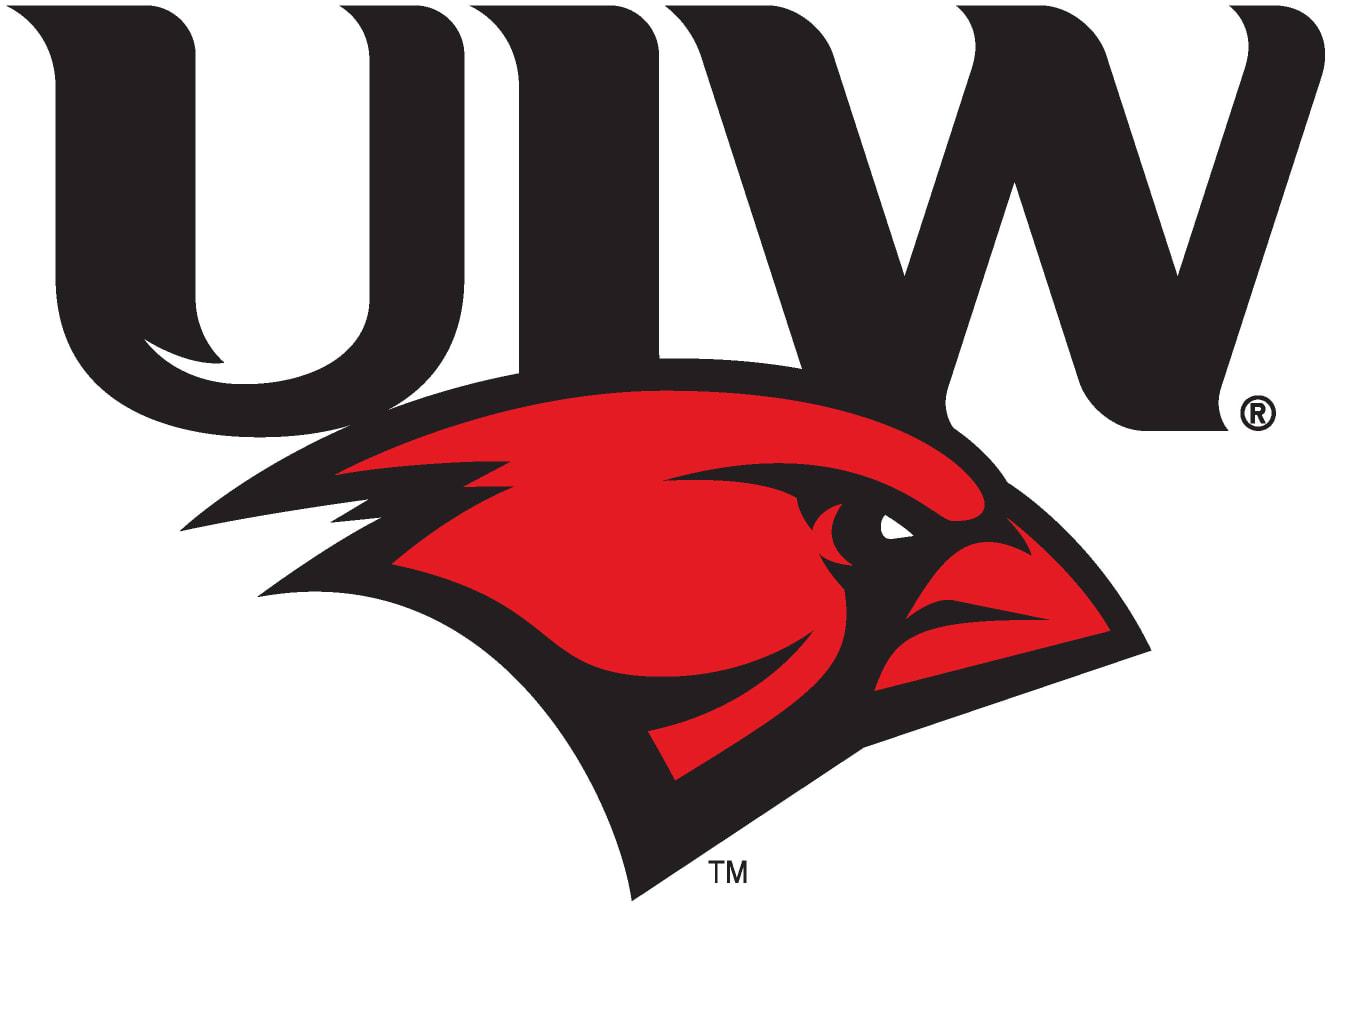 uiw_eap_logo-(1)-w2696-w1348.jpg